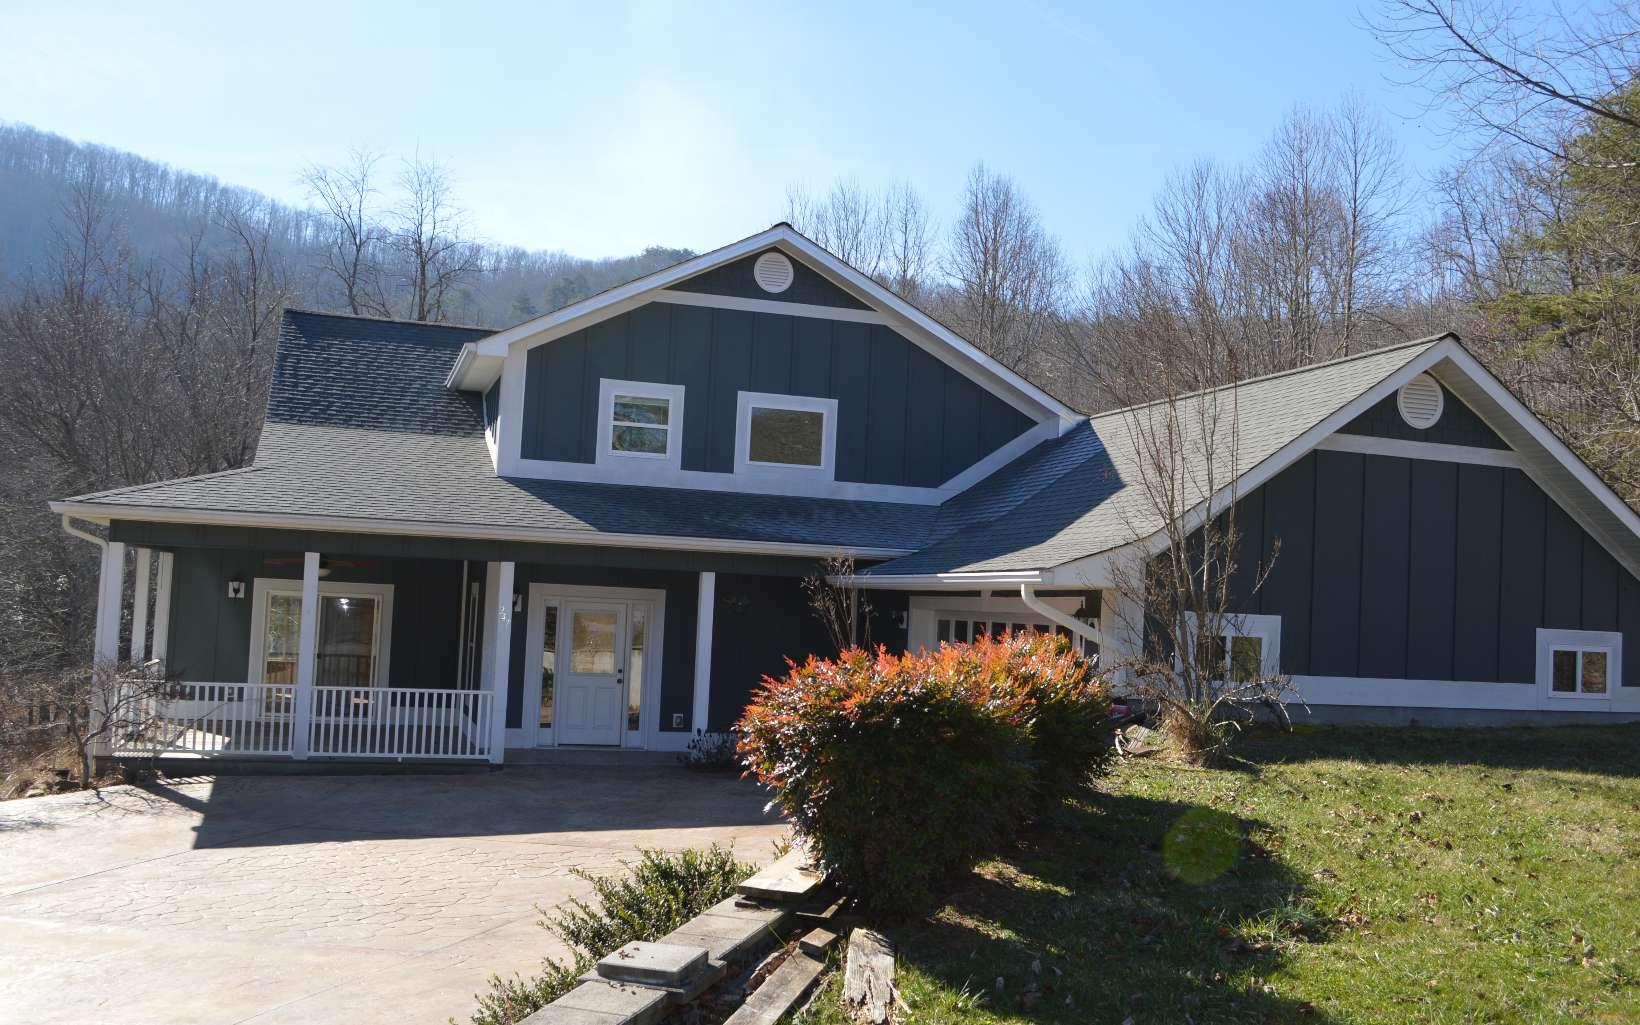 North Georgia Mountain Homes for Sale